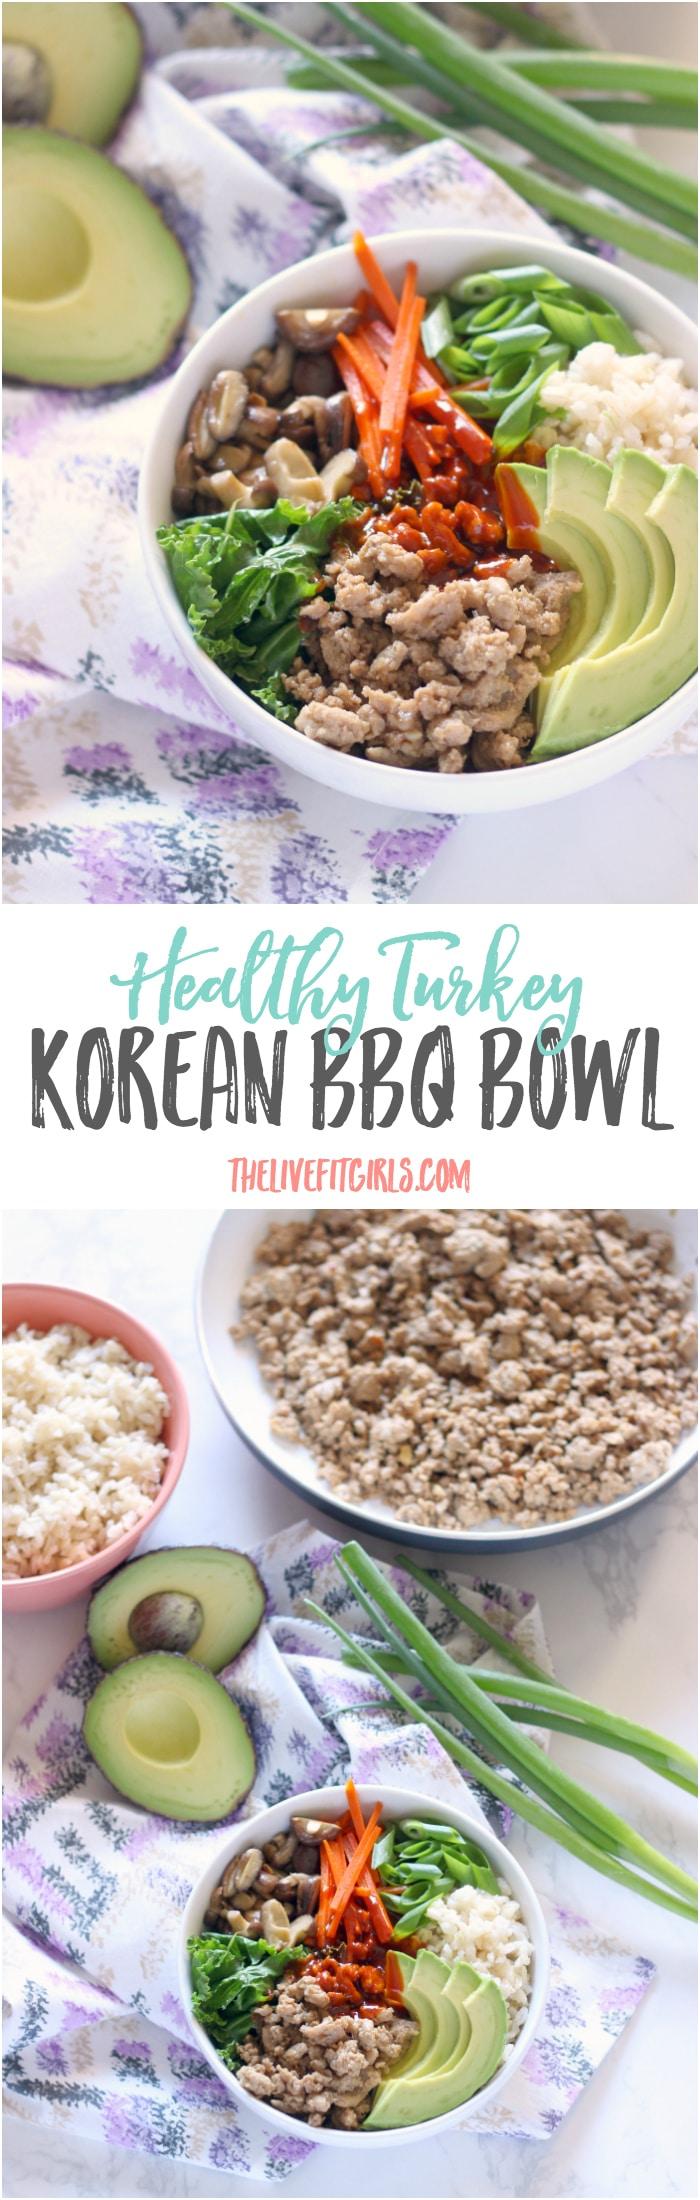 healthy-korean-bbq-bowl-pin